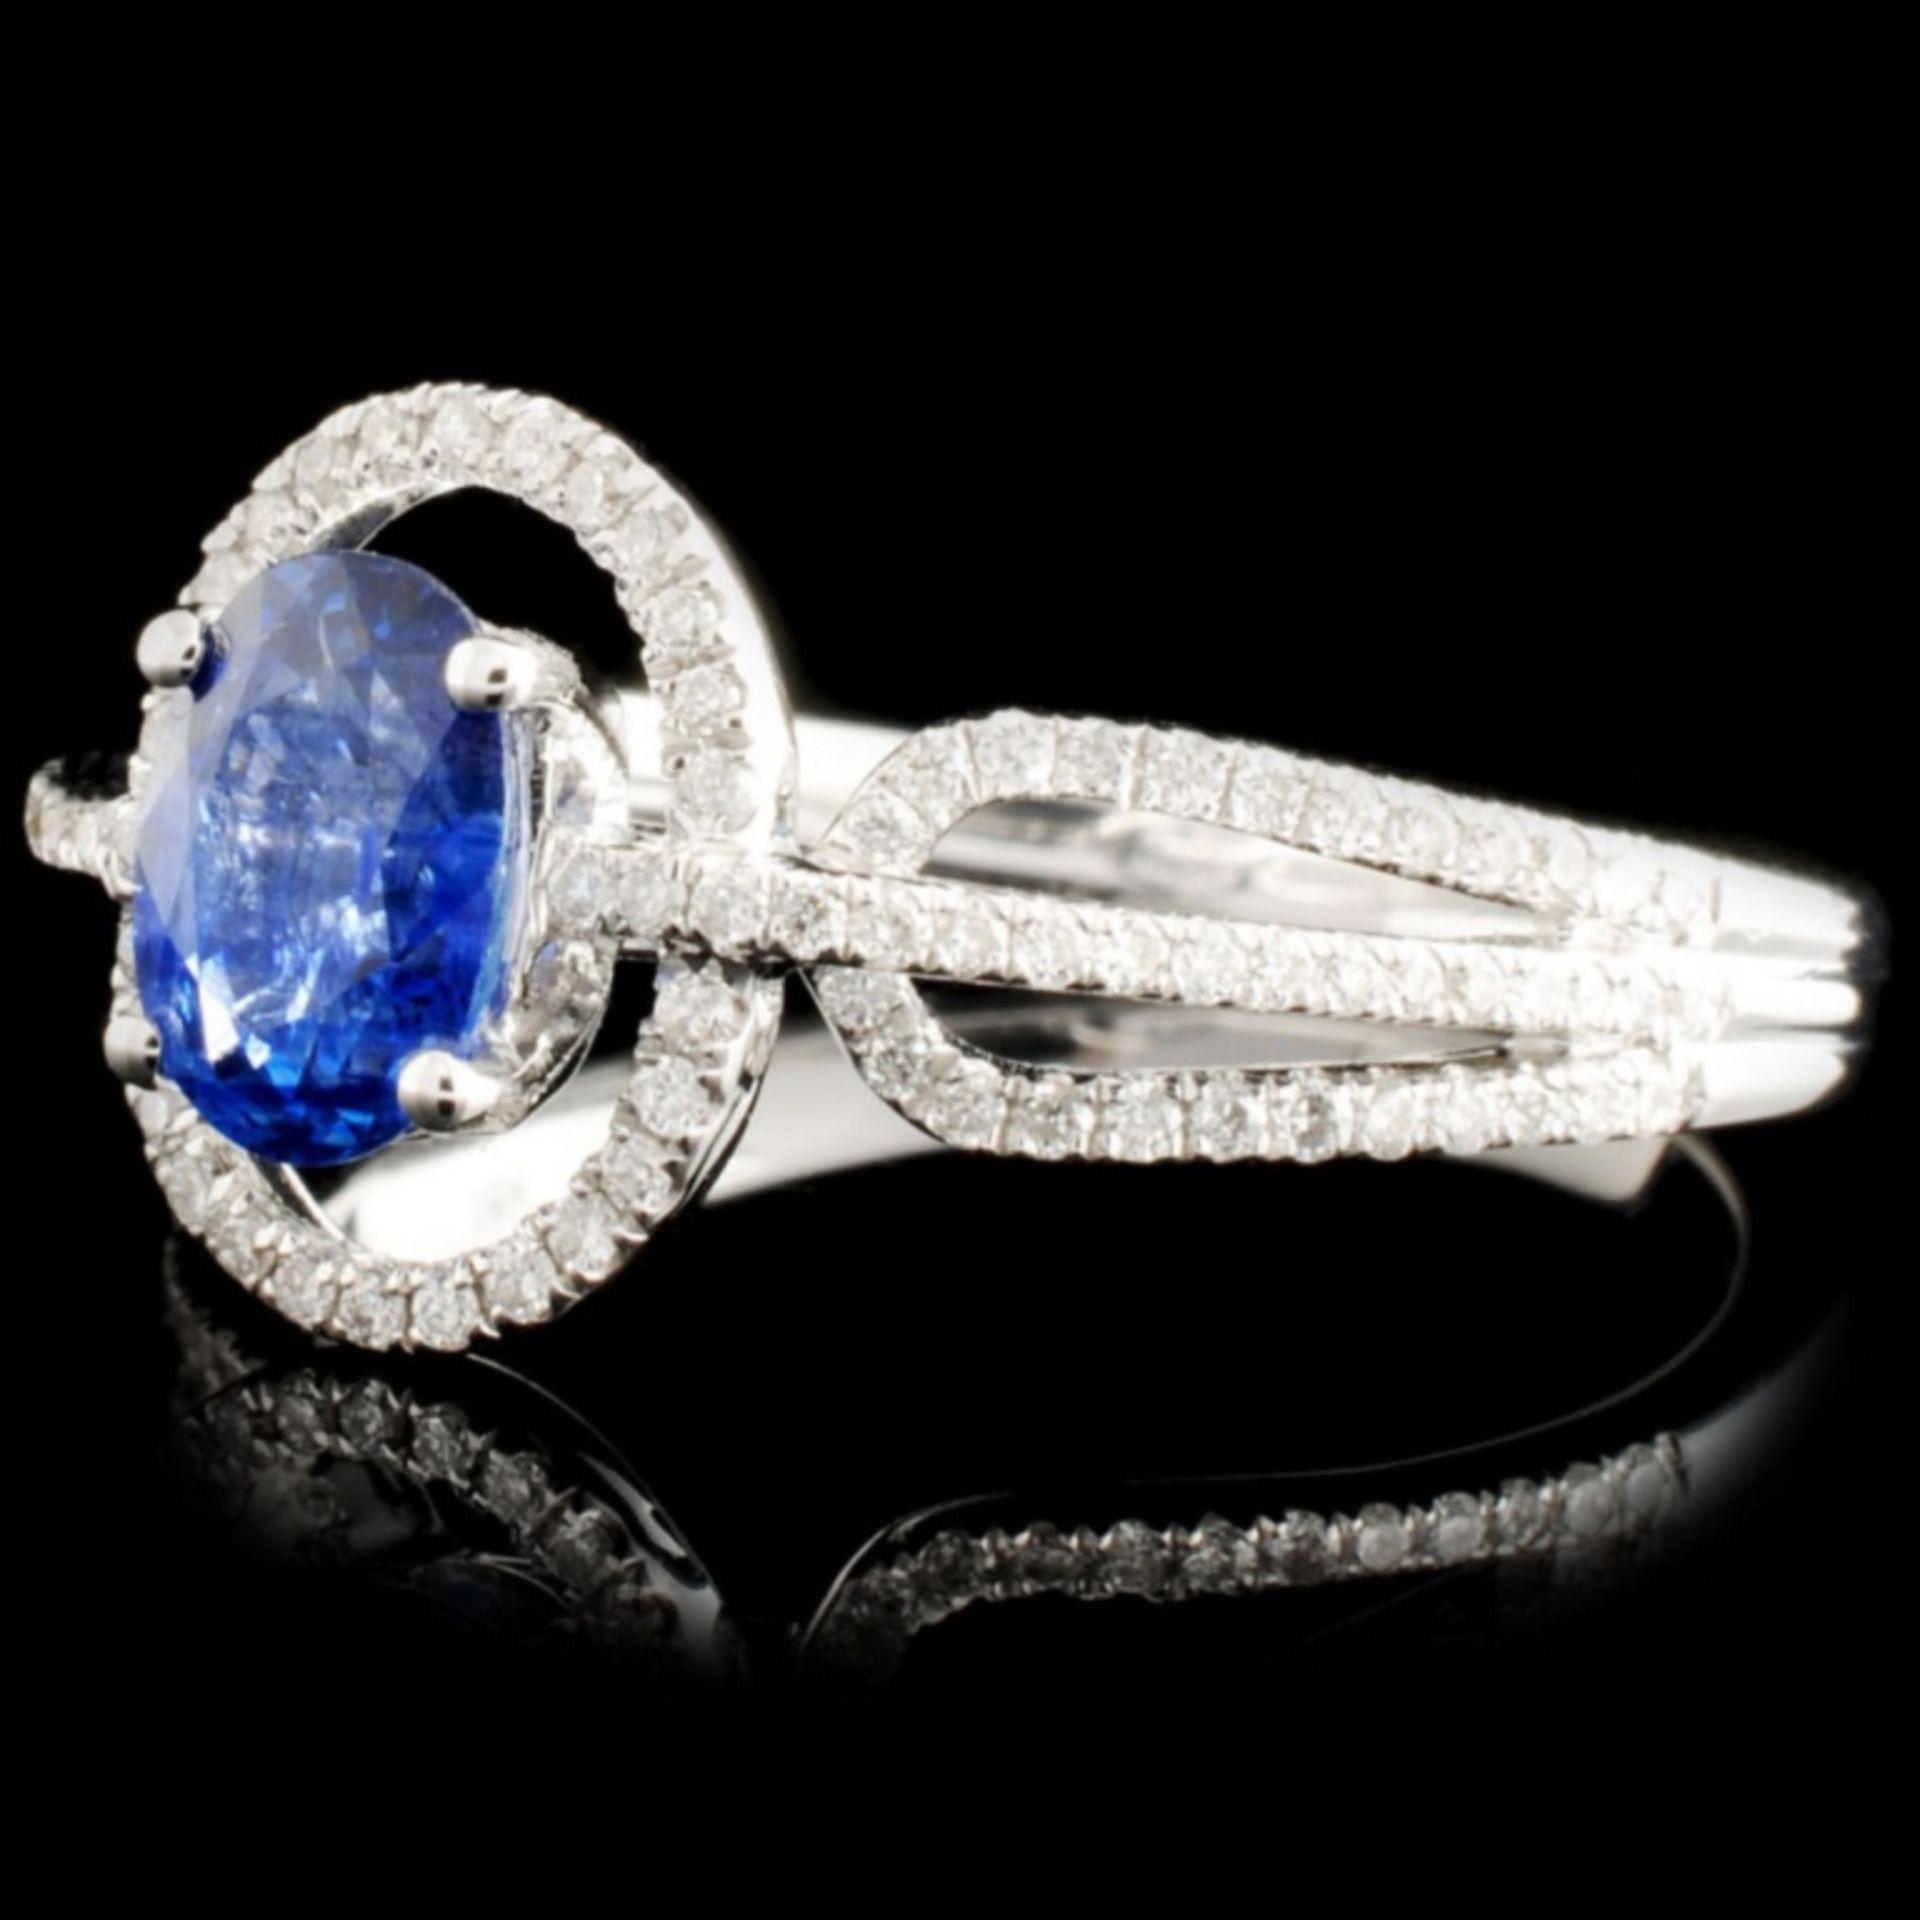 18K Gold 0.86ct Sapphire & 0.32ctw Diamond Ring - Image 2 of 5